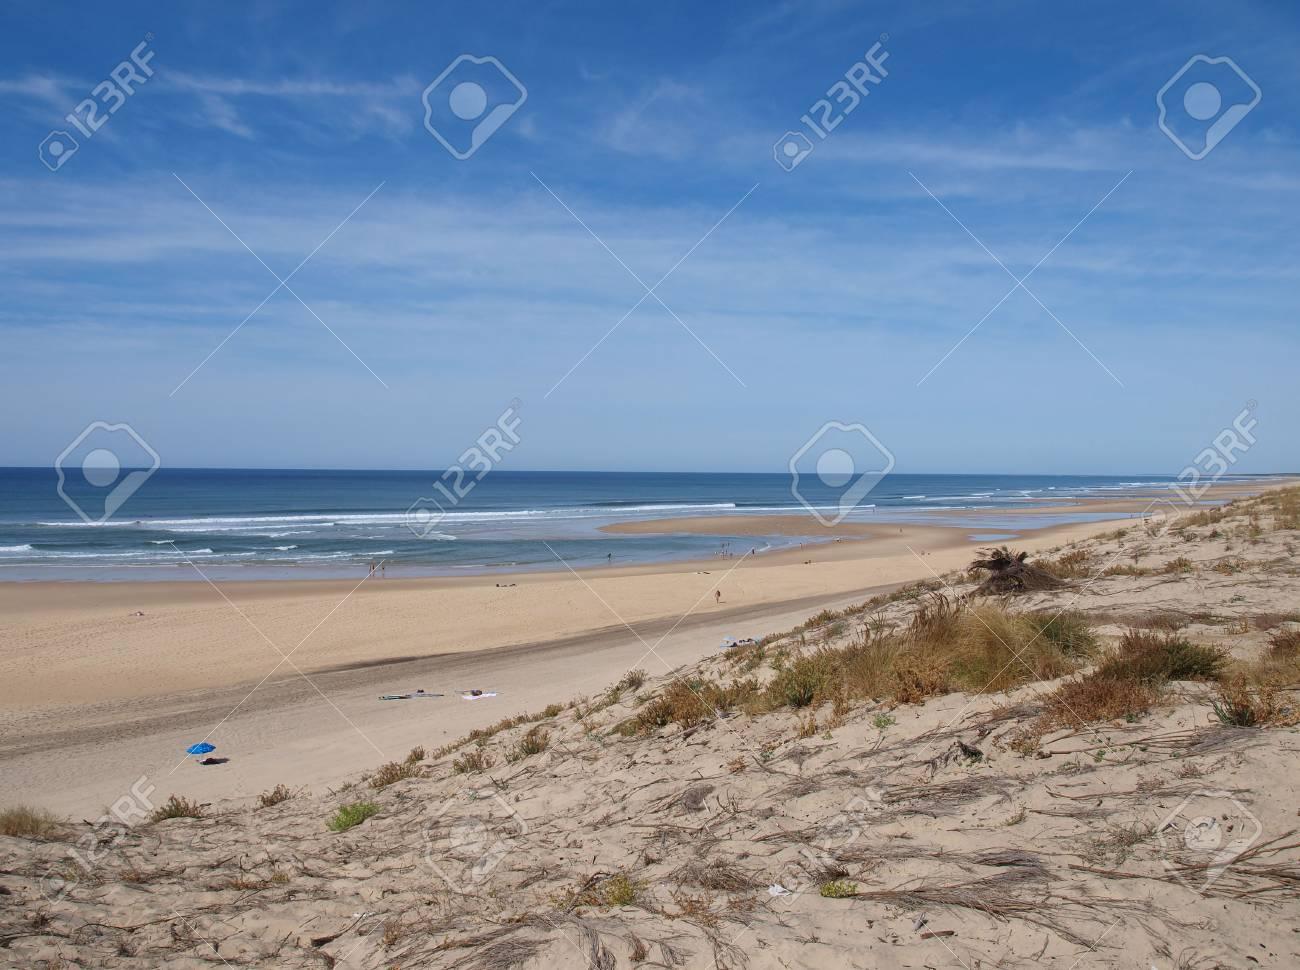 Stock Photo the great golden beach